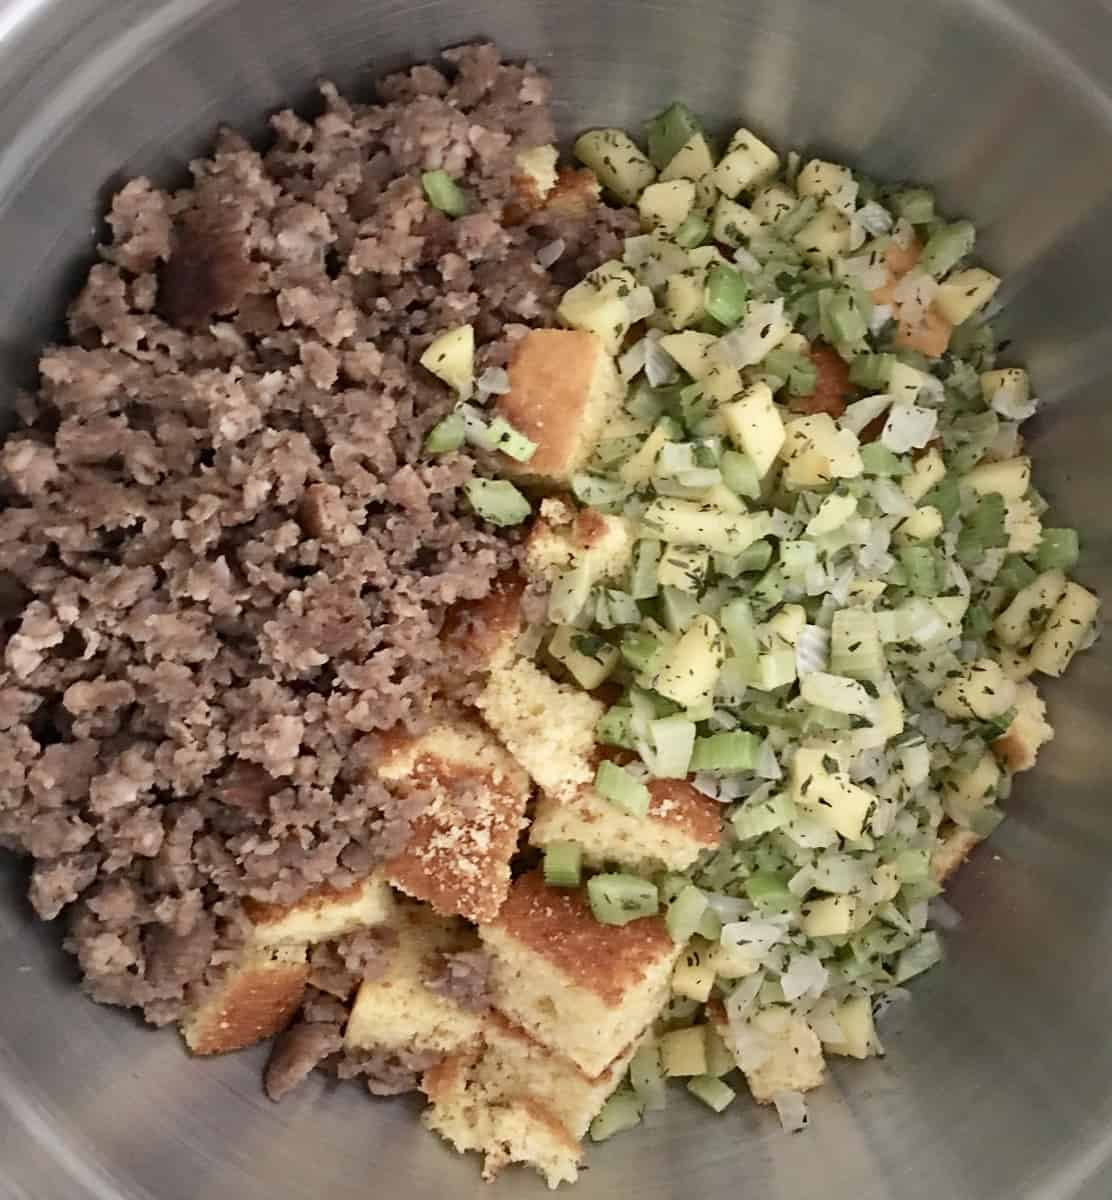 sausage, cornbread, and veggies in a bowl for make-ahead cornbread stuffing.